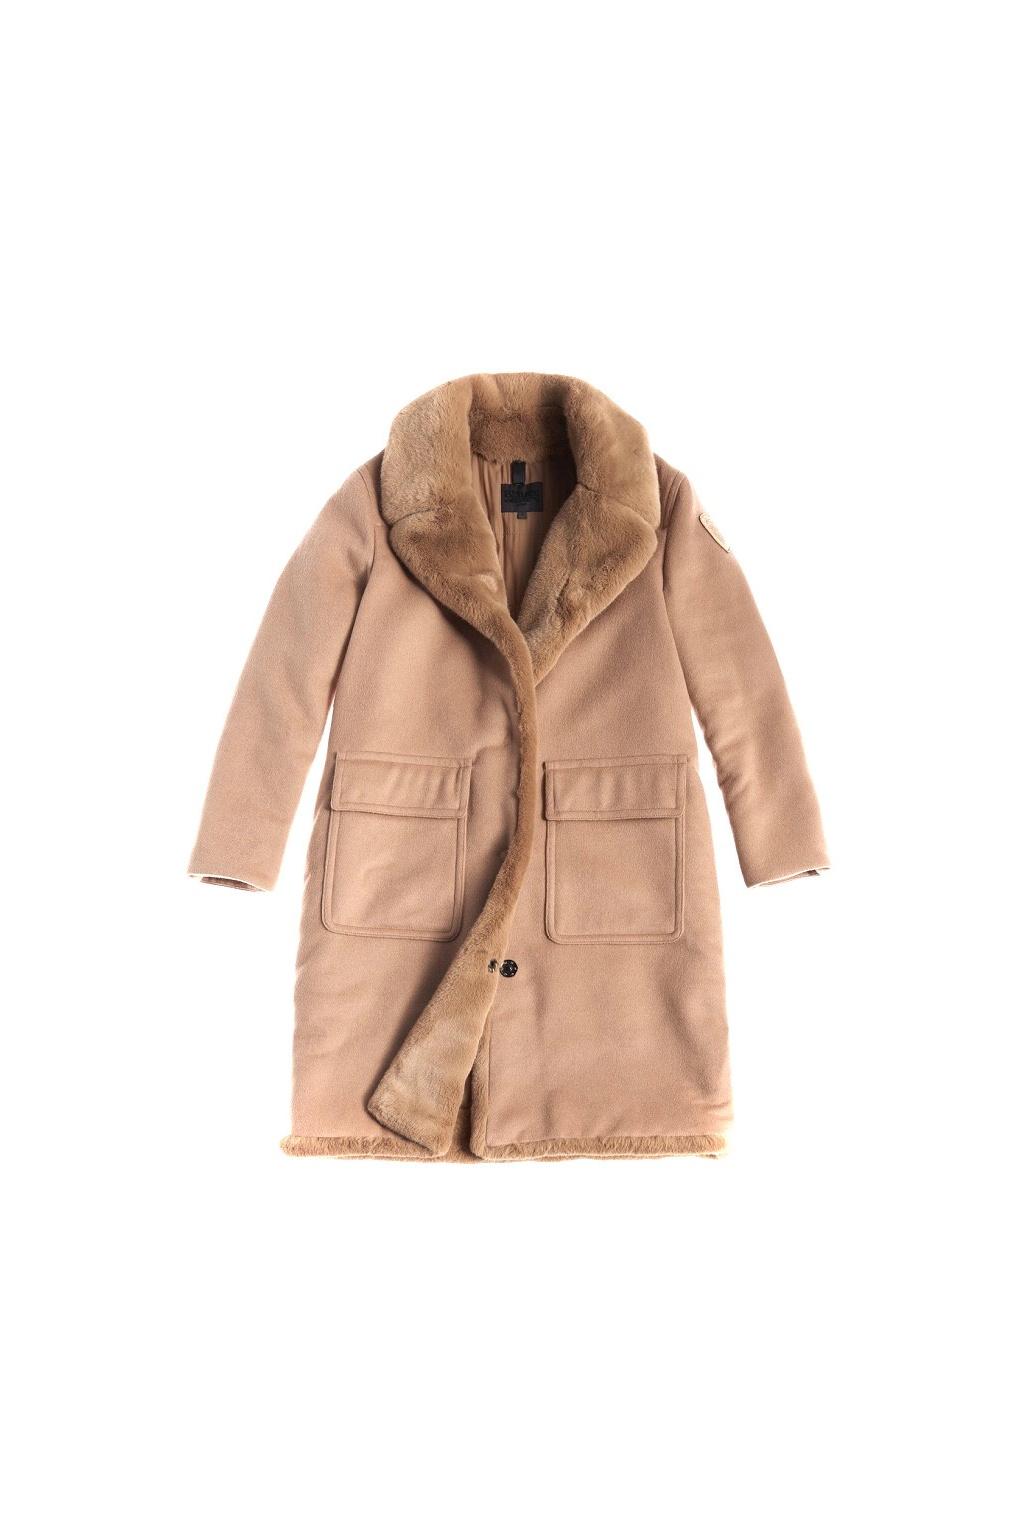 20WBLDK01571 005831 336 Dámský kabát Blauer hnědý